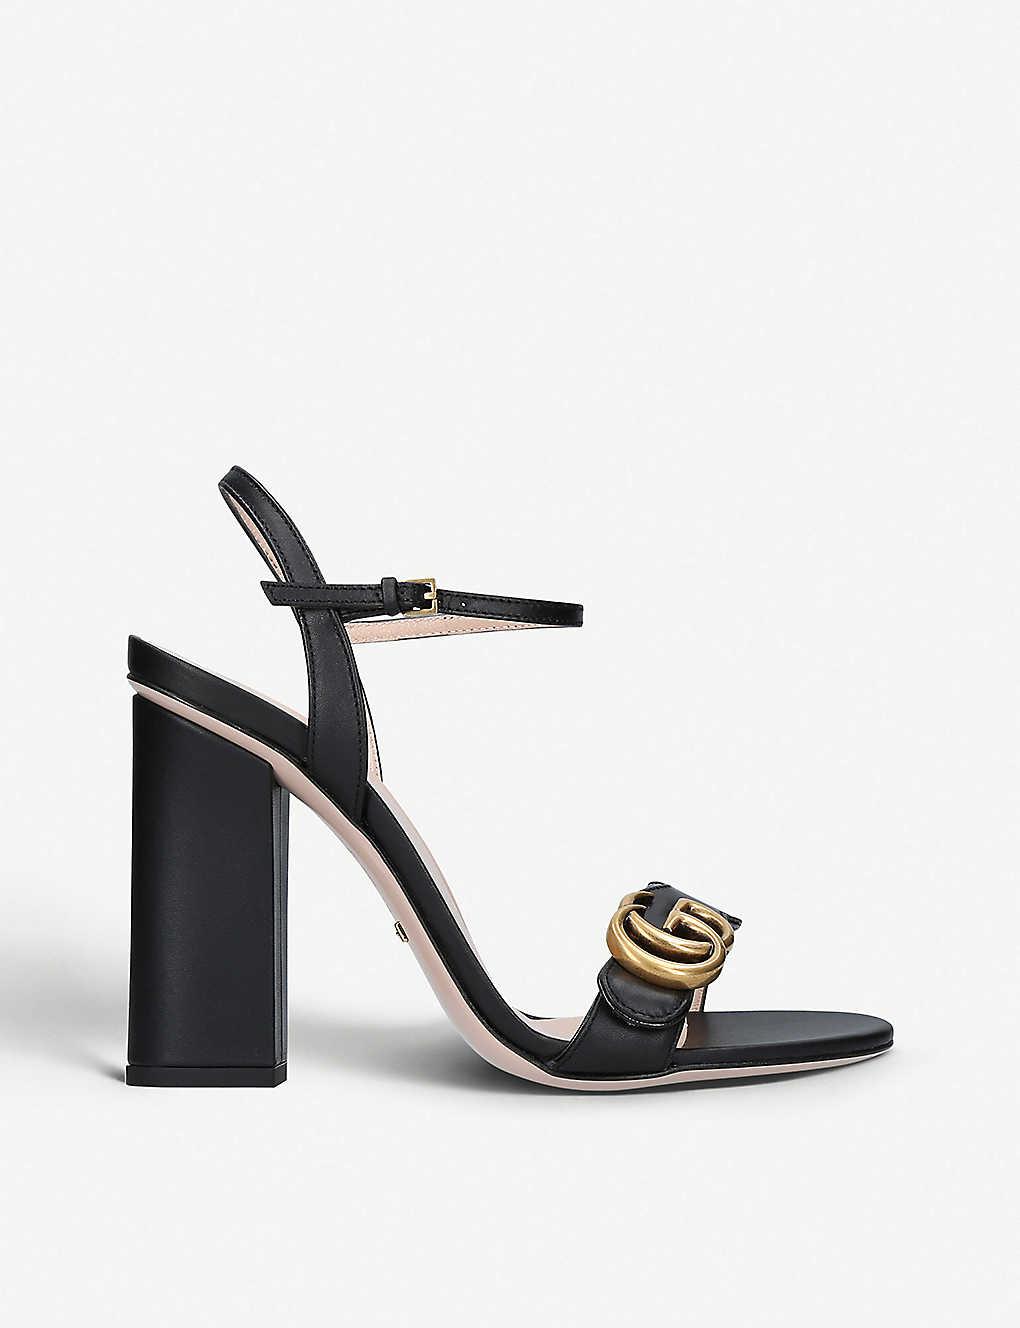 5312af3256b4 GUCCI - Marmont 105 leather sandals